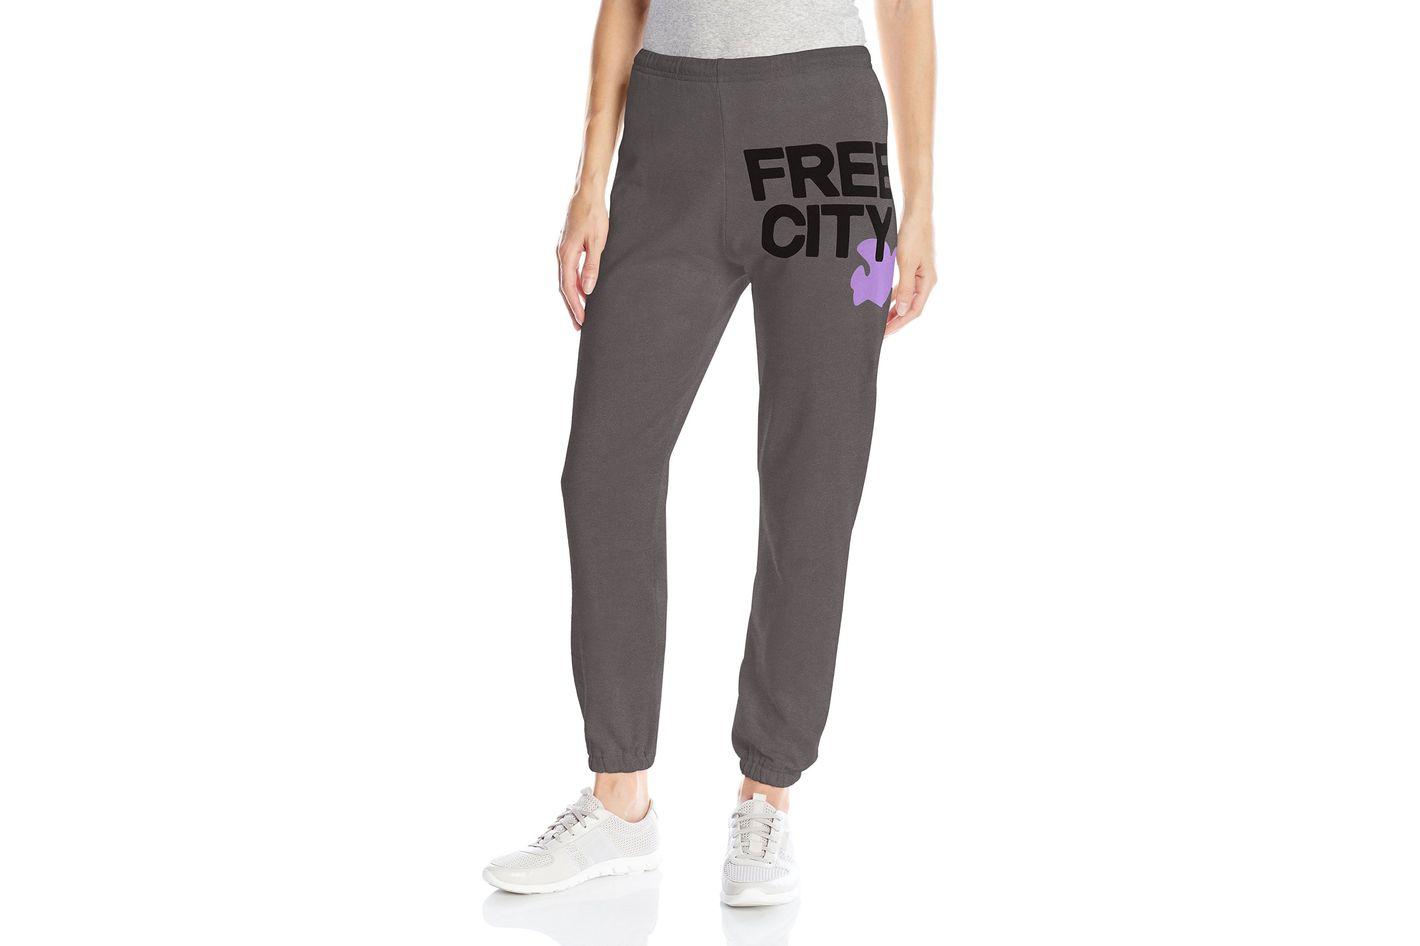 Free City Women's Sweatpants